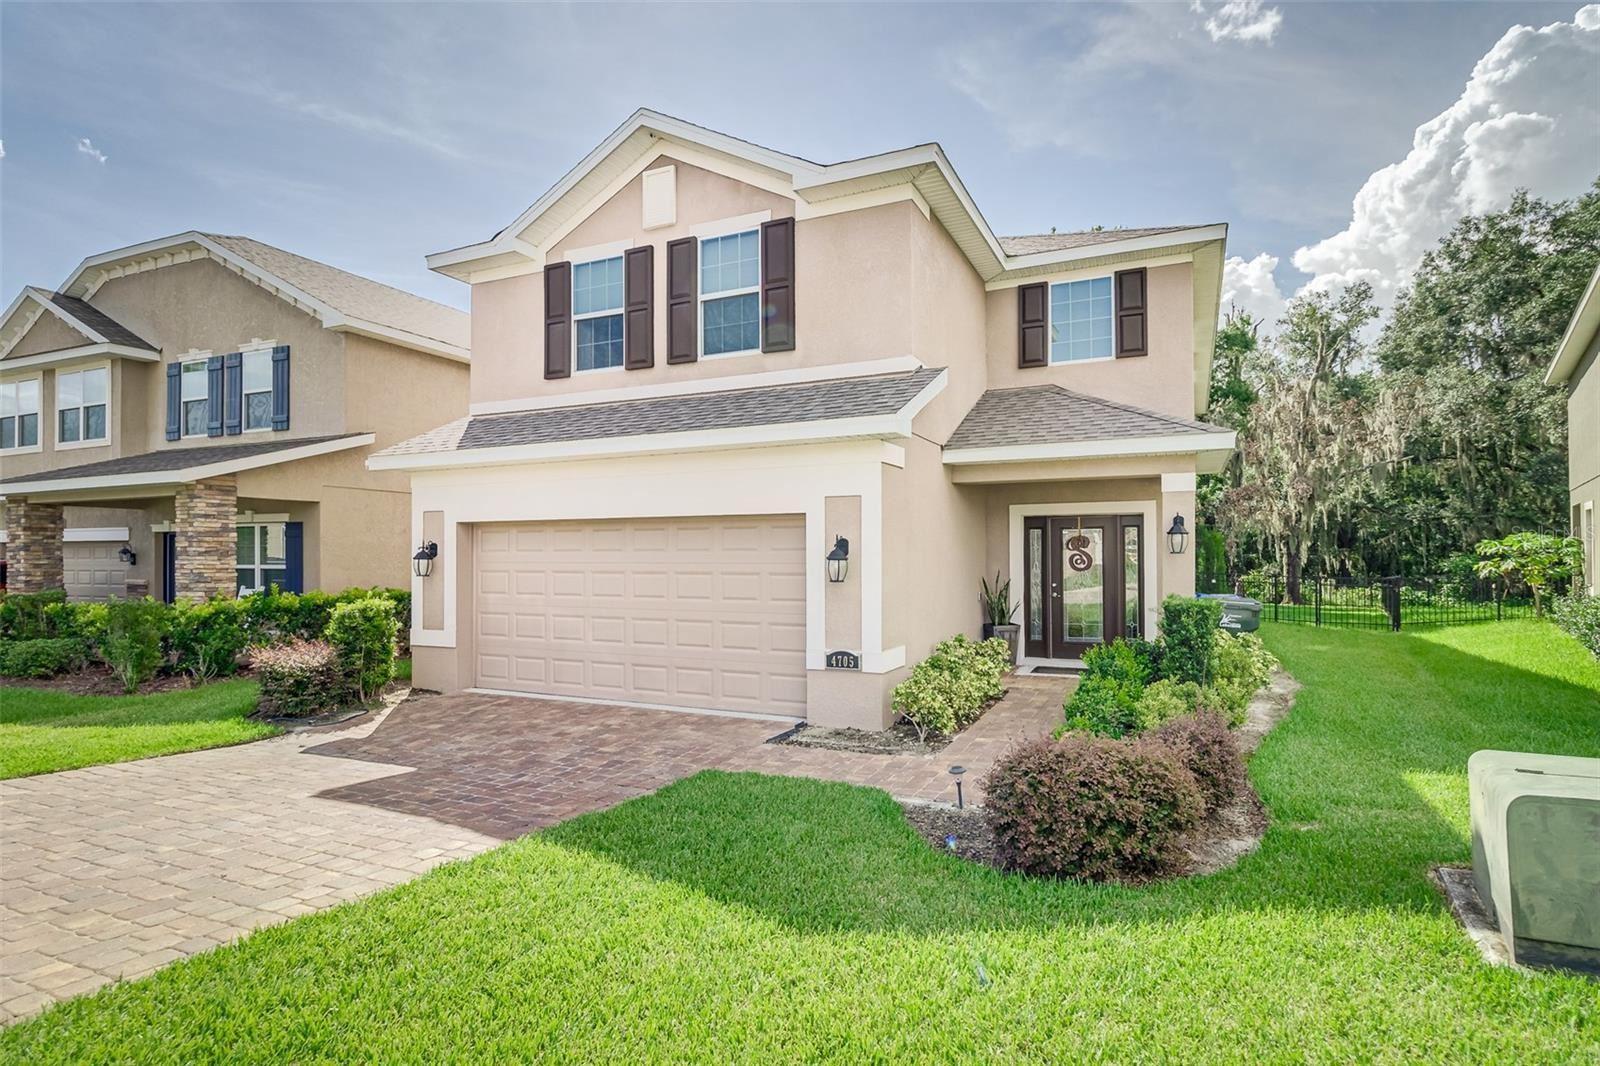 4705 LATHLOA LOOP, Lakeland, FL 33811 - #: L4924224